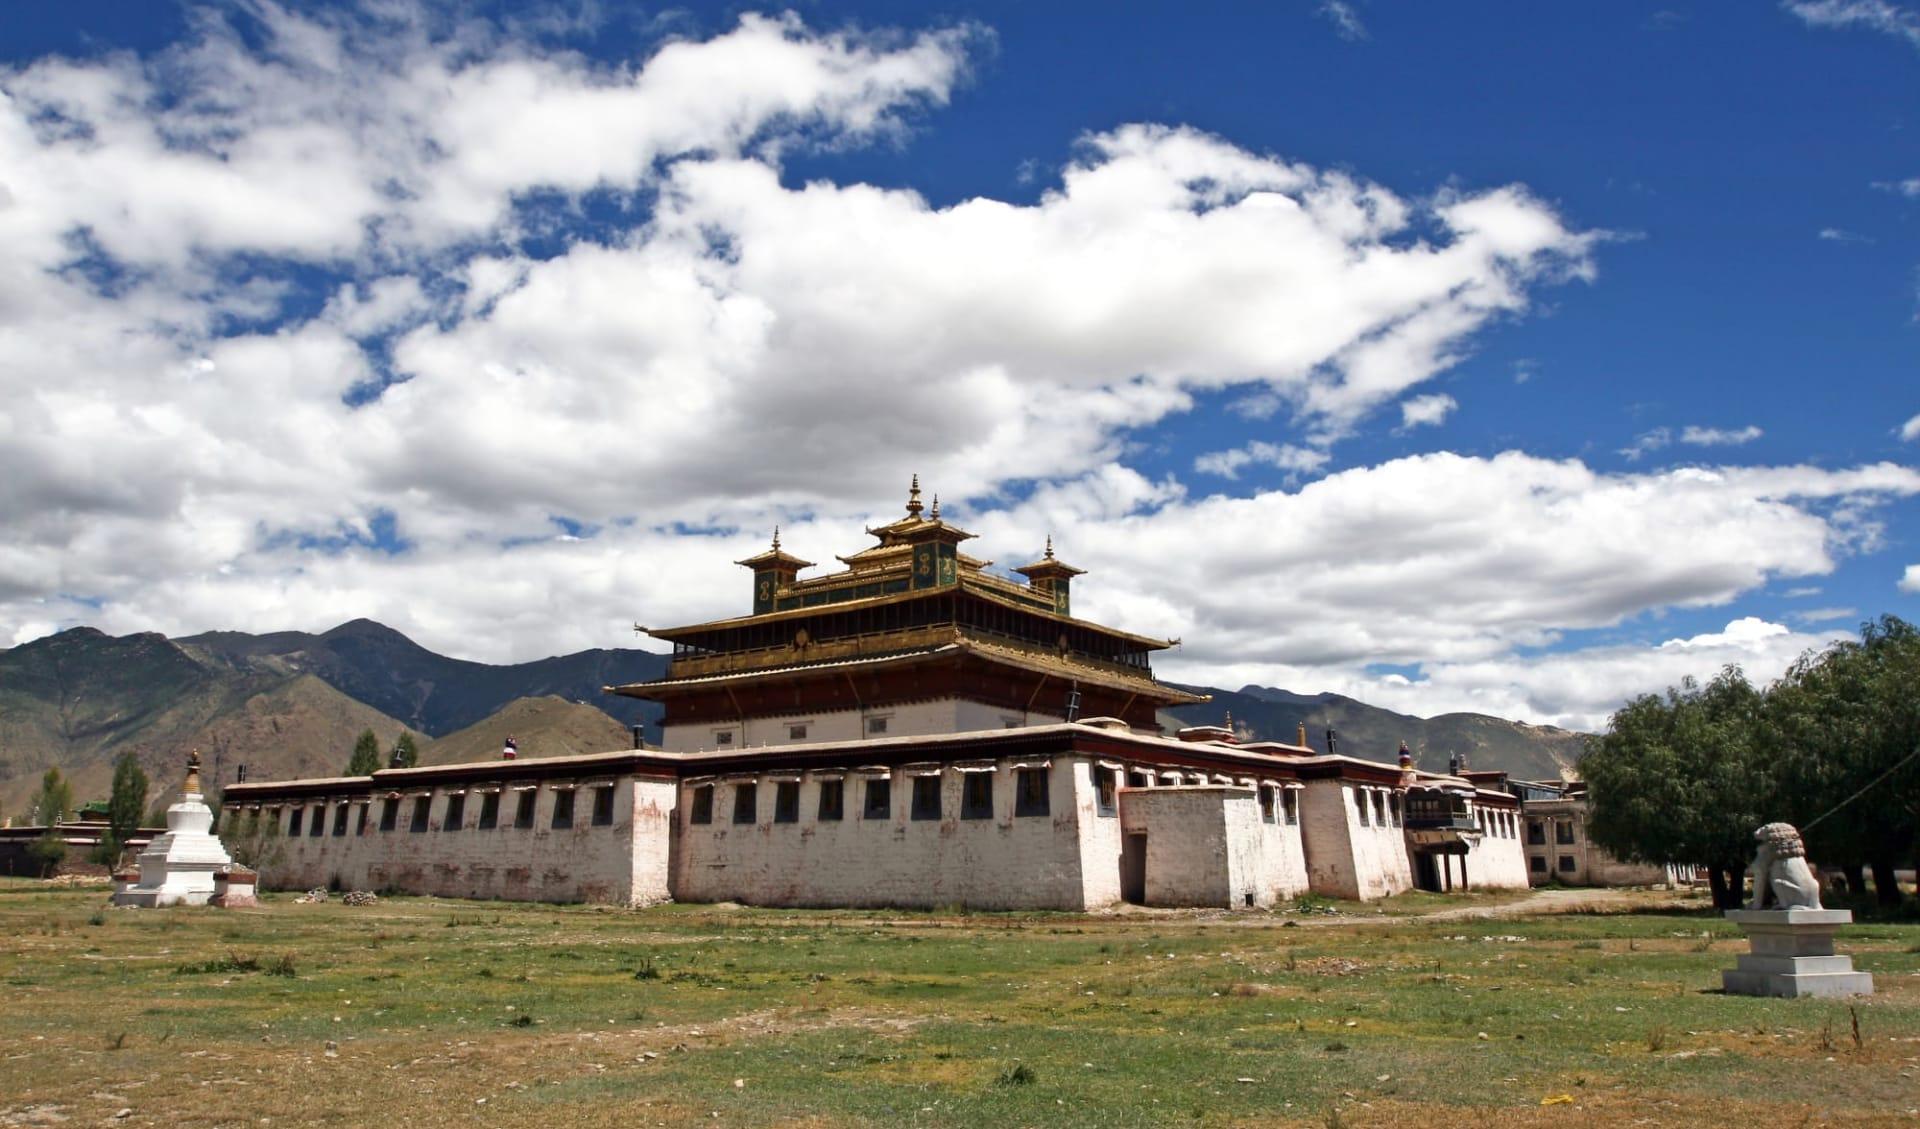 Die Magie des Tibets - Basis & Tsetang Verlängerung ab Lhasa: Samye Monastery in Tibet